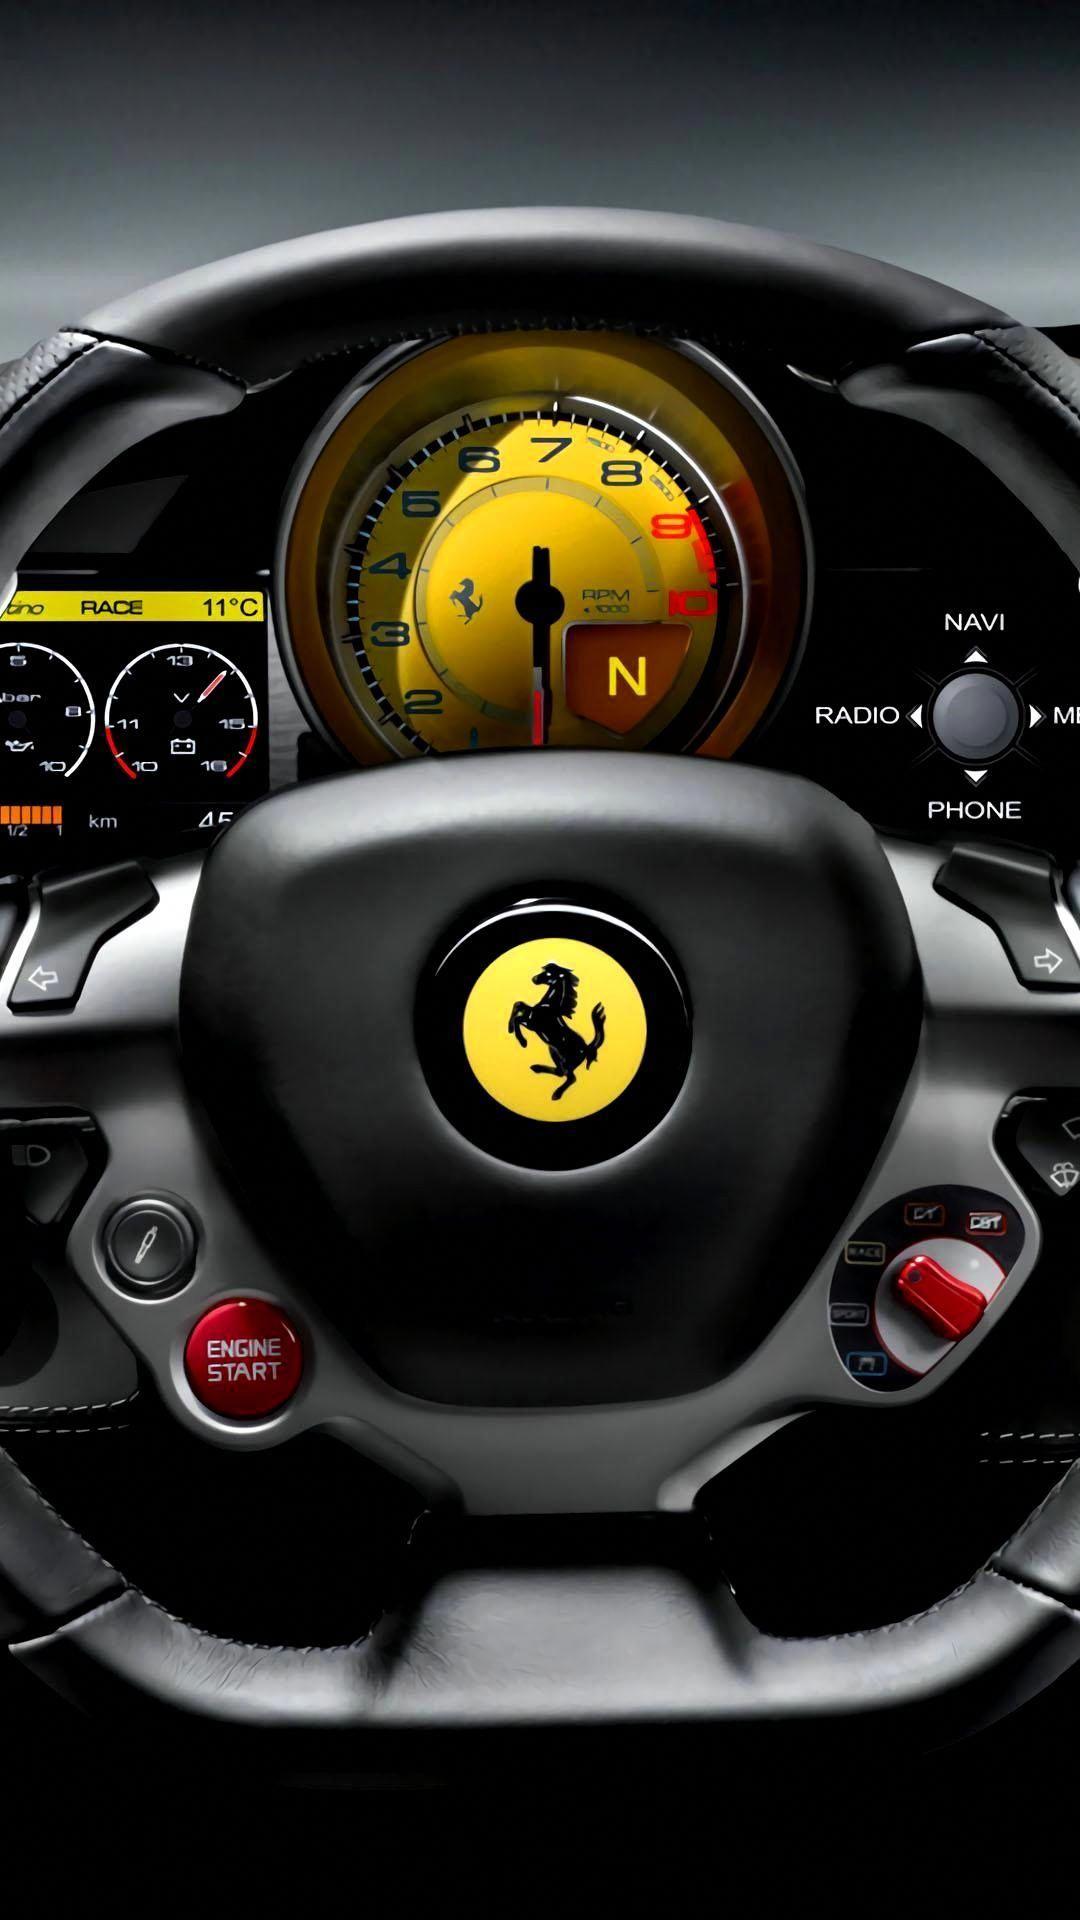 Supercar Wallpaper 4k Iphone Gallery Luxury Car Logos Super Cars Luxury Car Brands